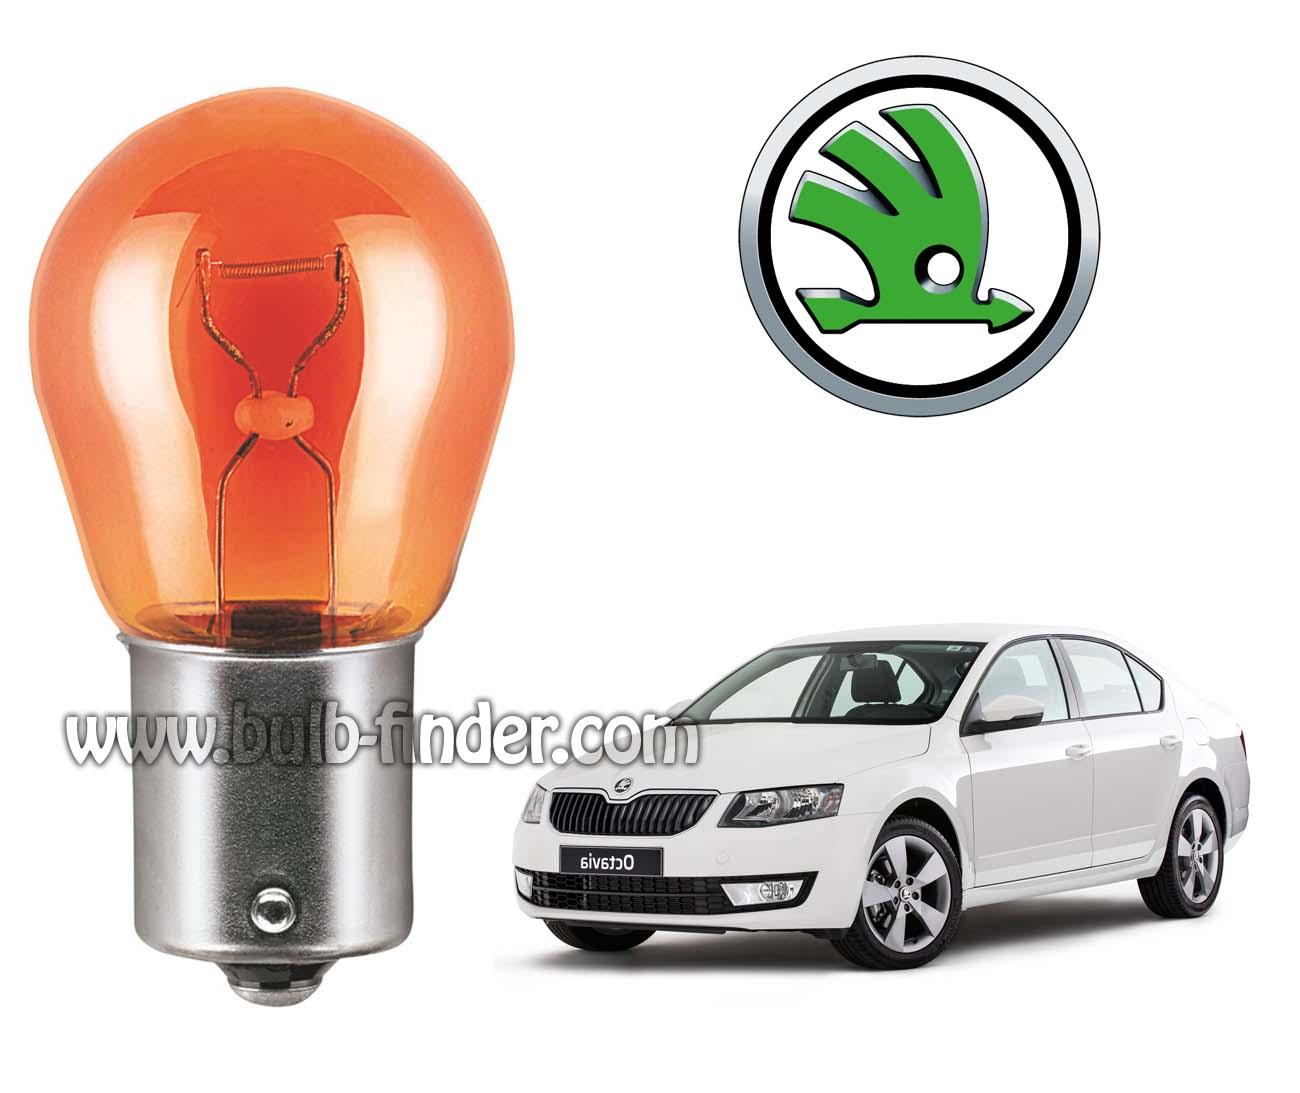 Skoda Octavia bulb model DIRECTION TURN SIGNAL